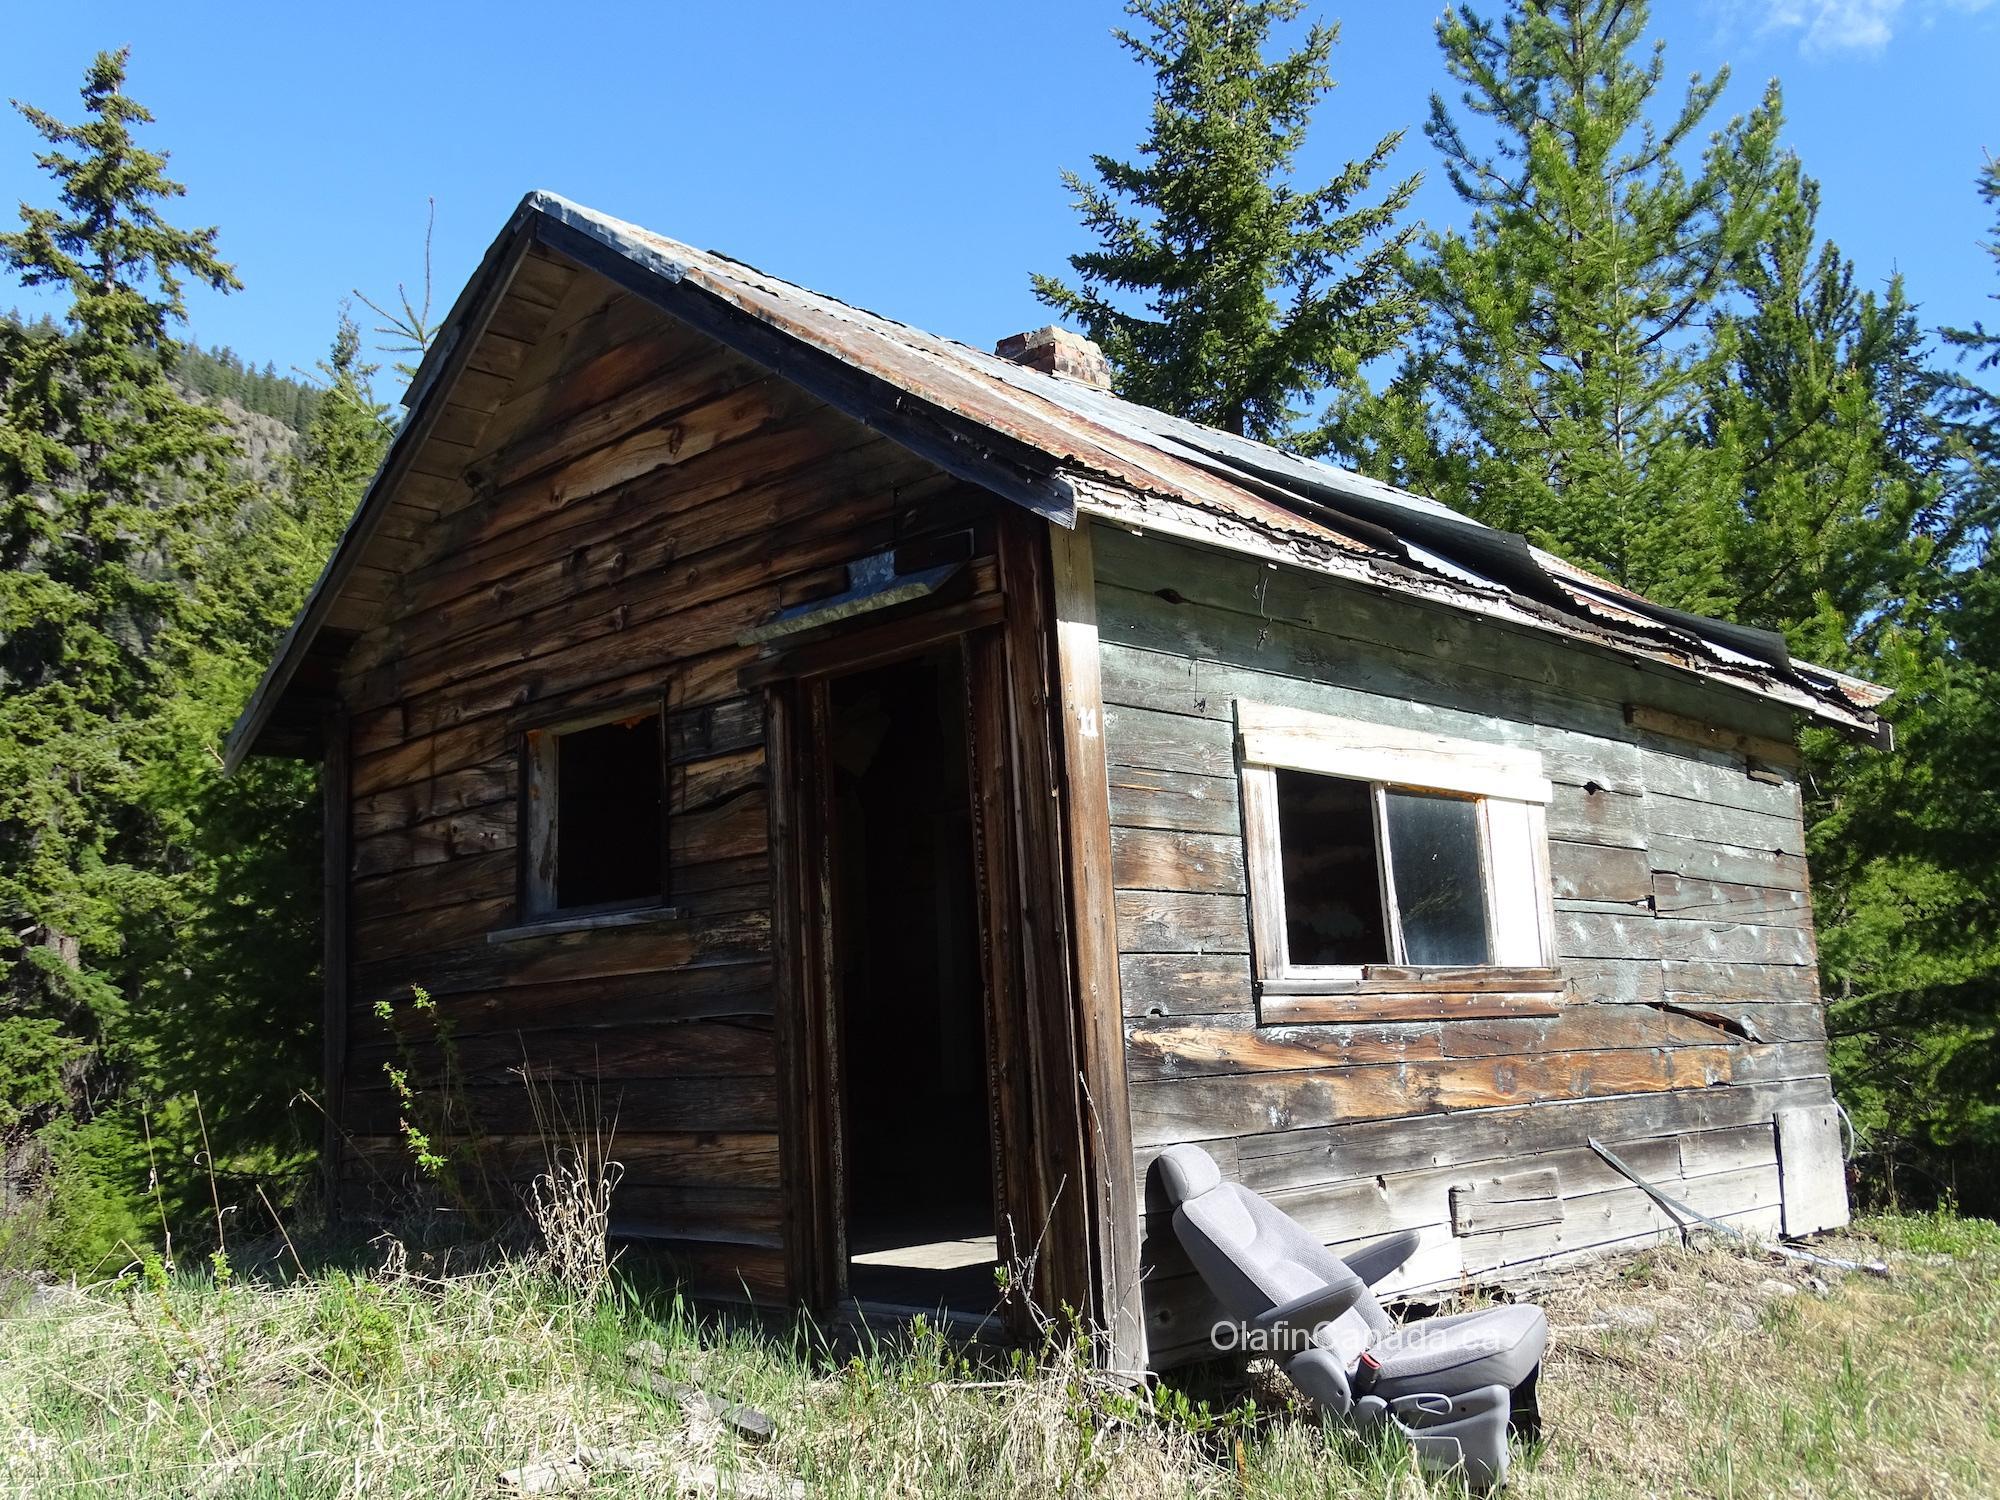 Small house in Ogden, BC #olafincanada #britishcolumbia #discoverbc #abandonedbc